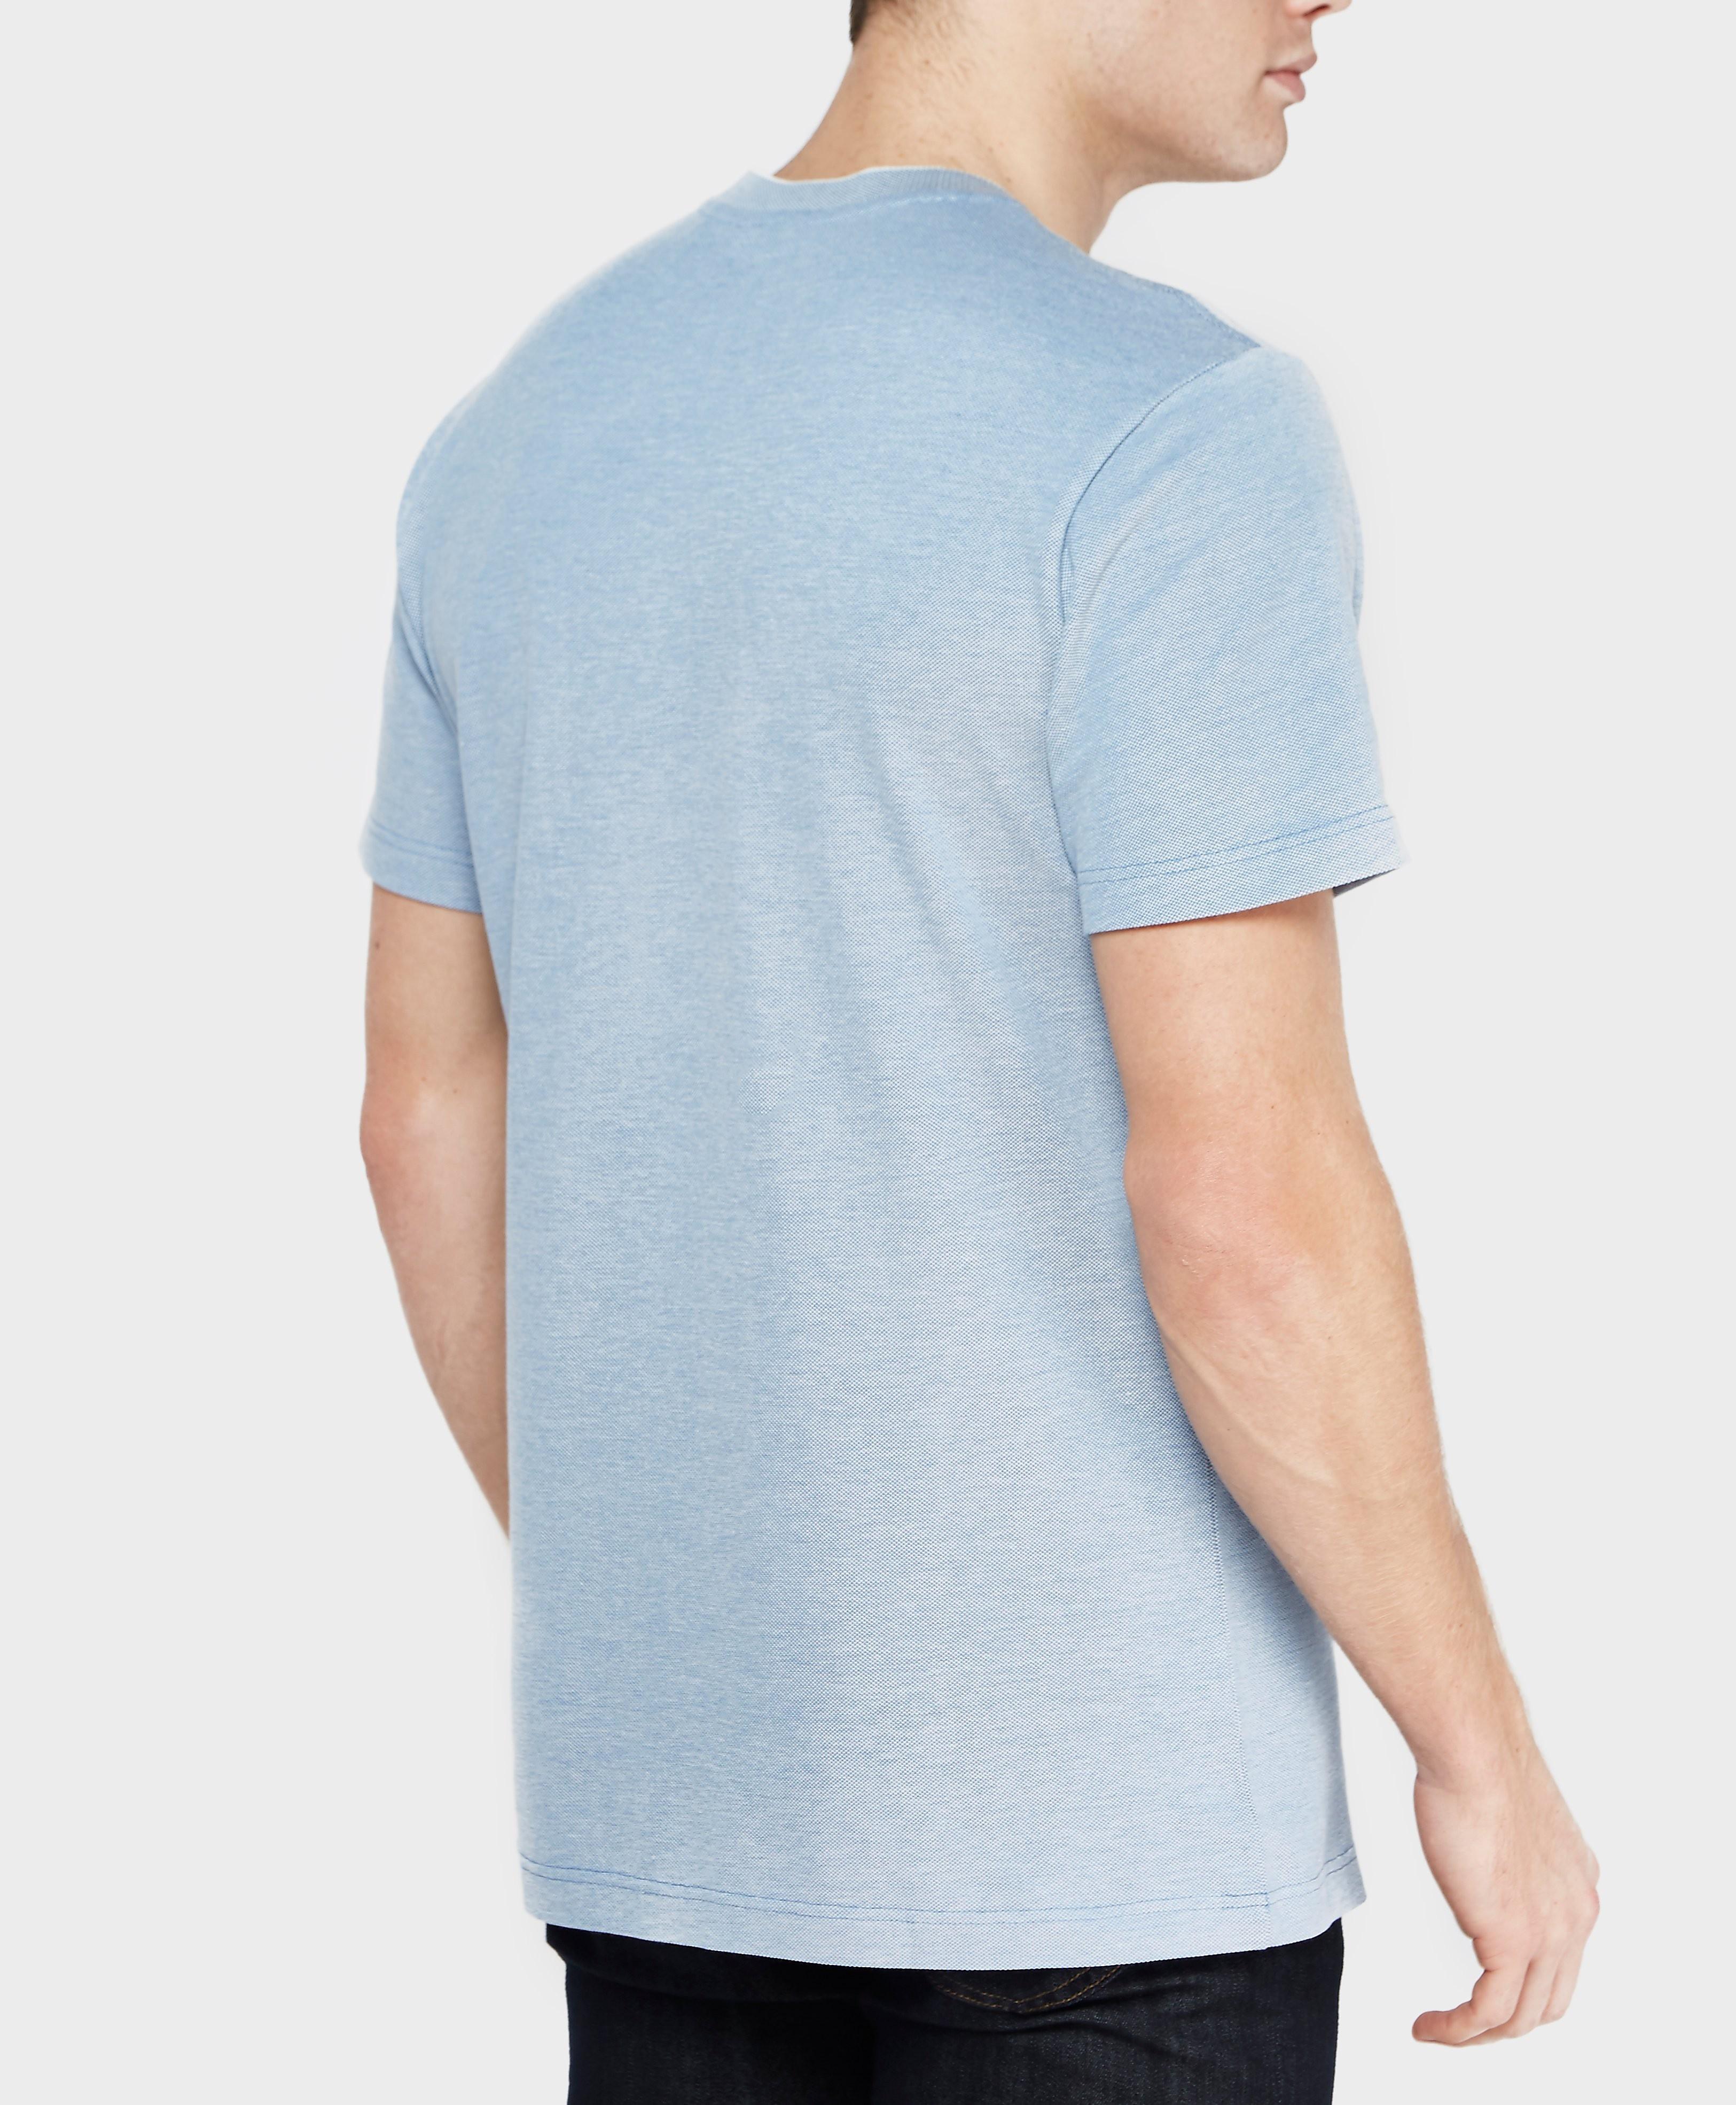 Lacoste Beye Pique T-Shirt